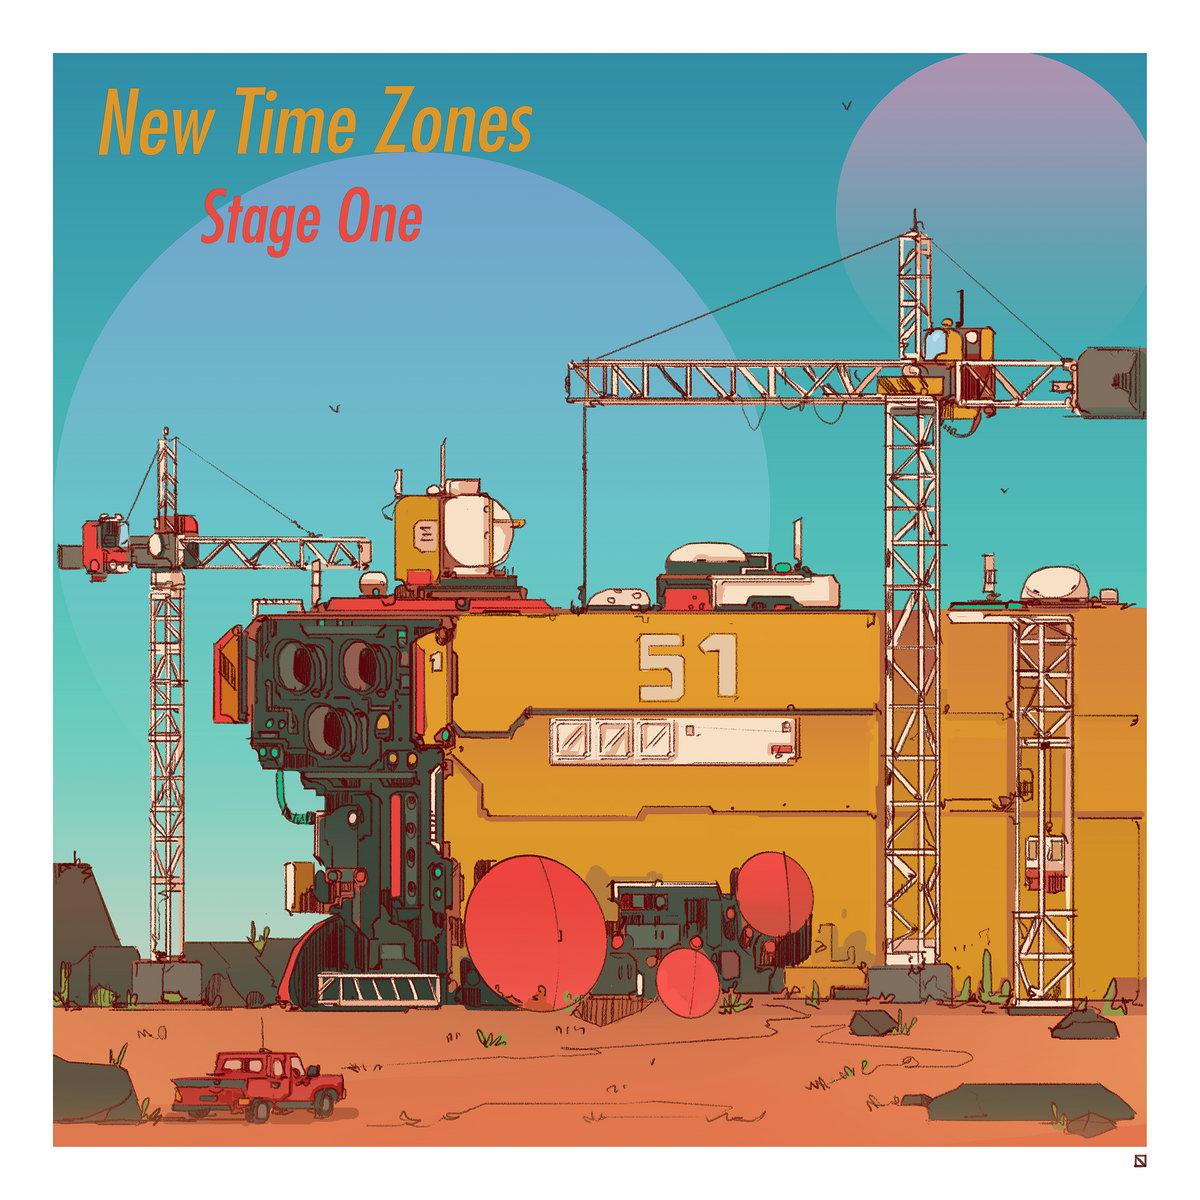 New Time Zones